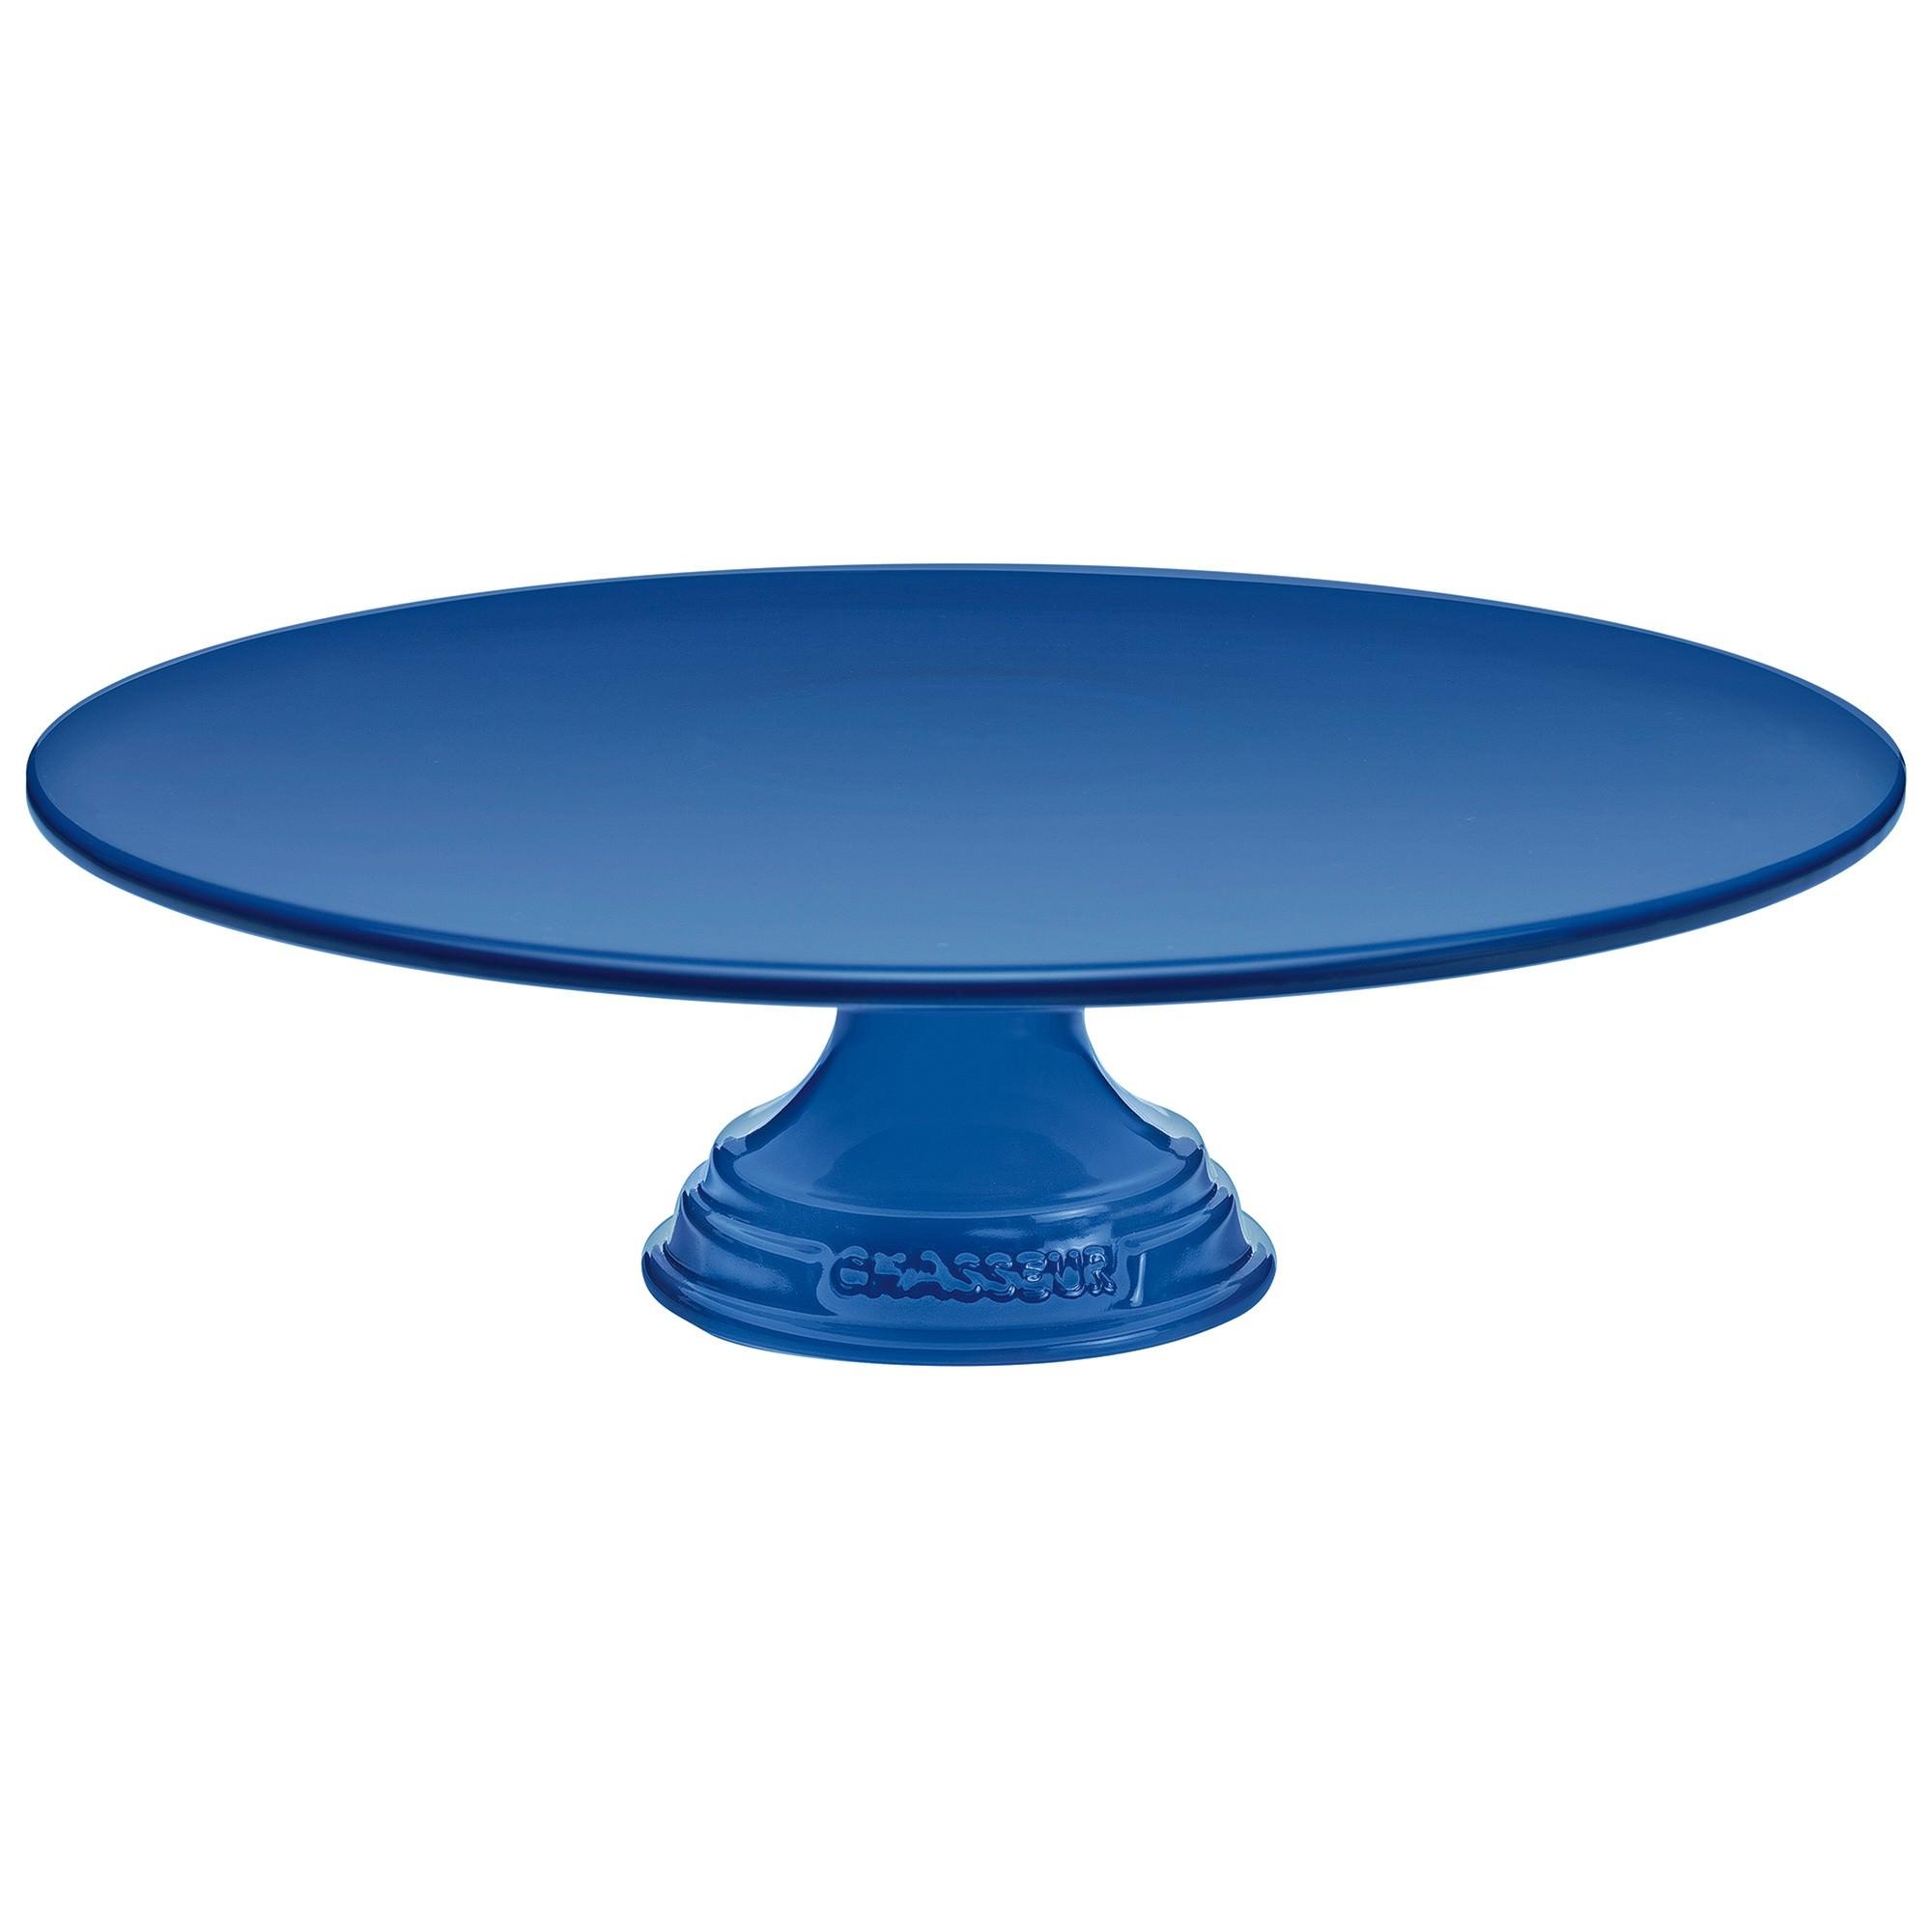 Chasseur La Cuisson Cake Stand - Blue